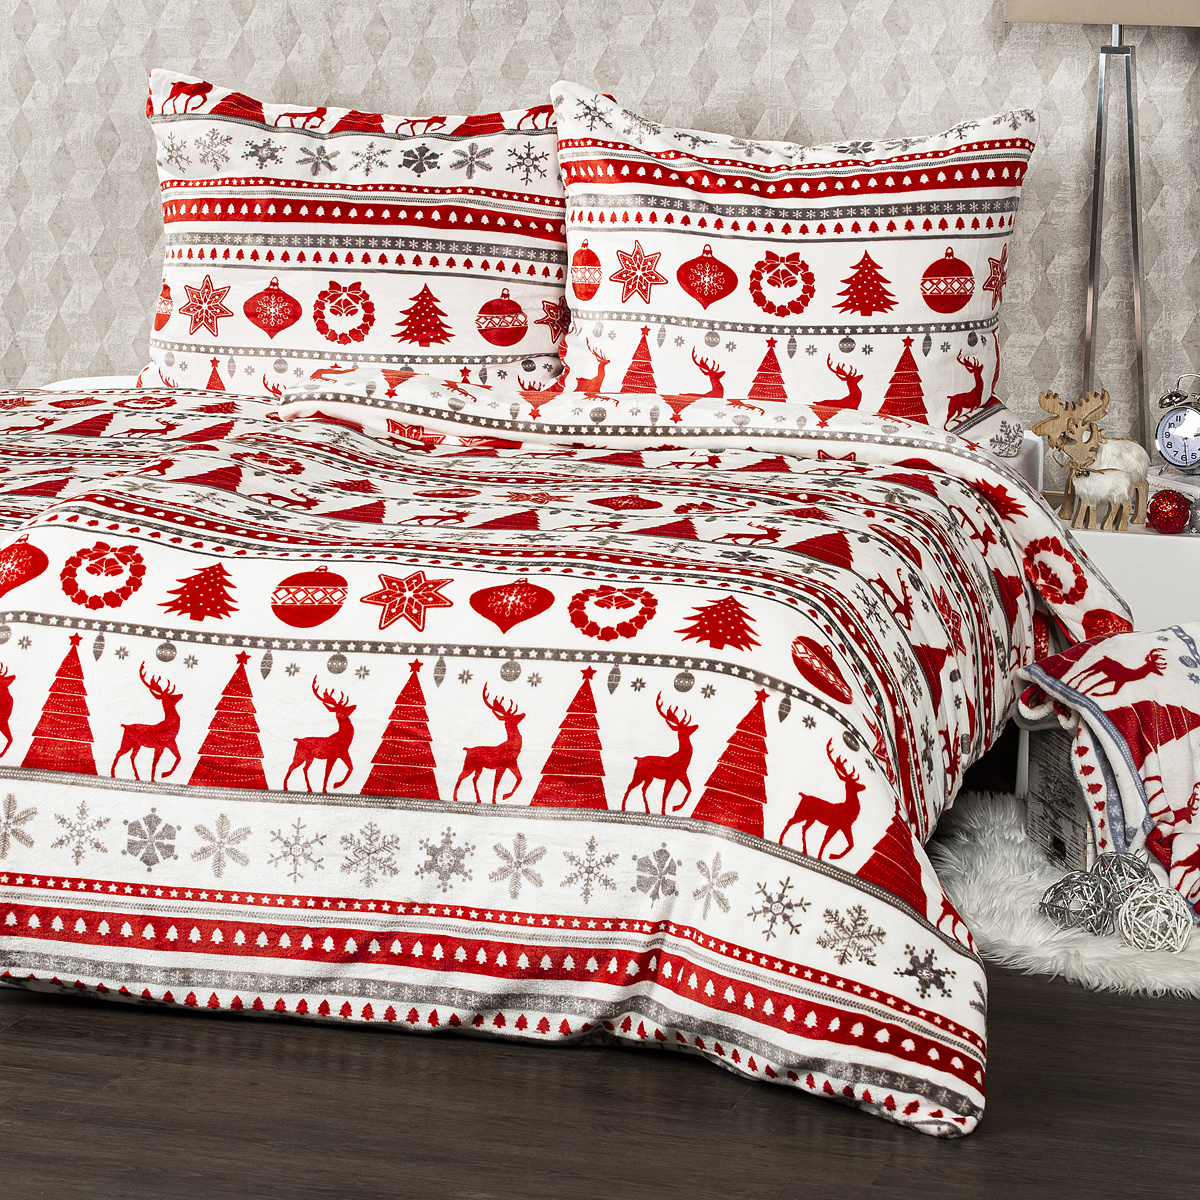 4Home Christmas Time mikroflanel ágynemű, piros, 140 x 200 cm, 70 x 90 cm, 140 x 220 cm, 70 x 90 cm